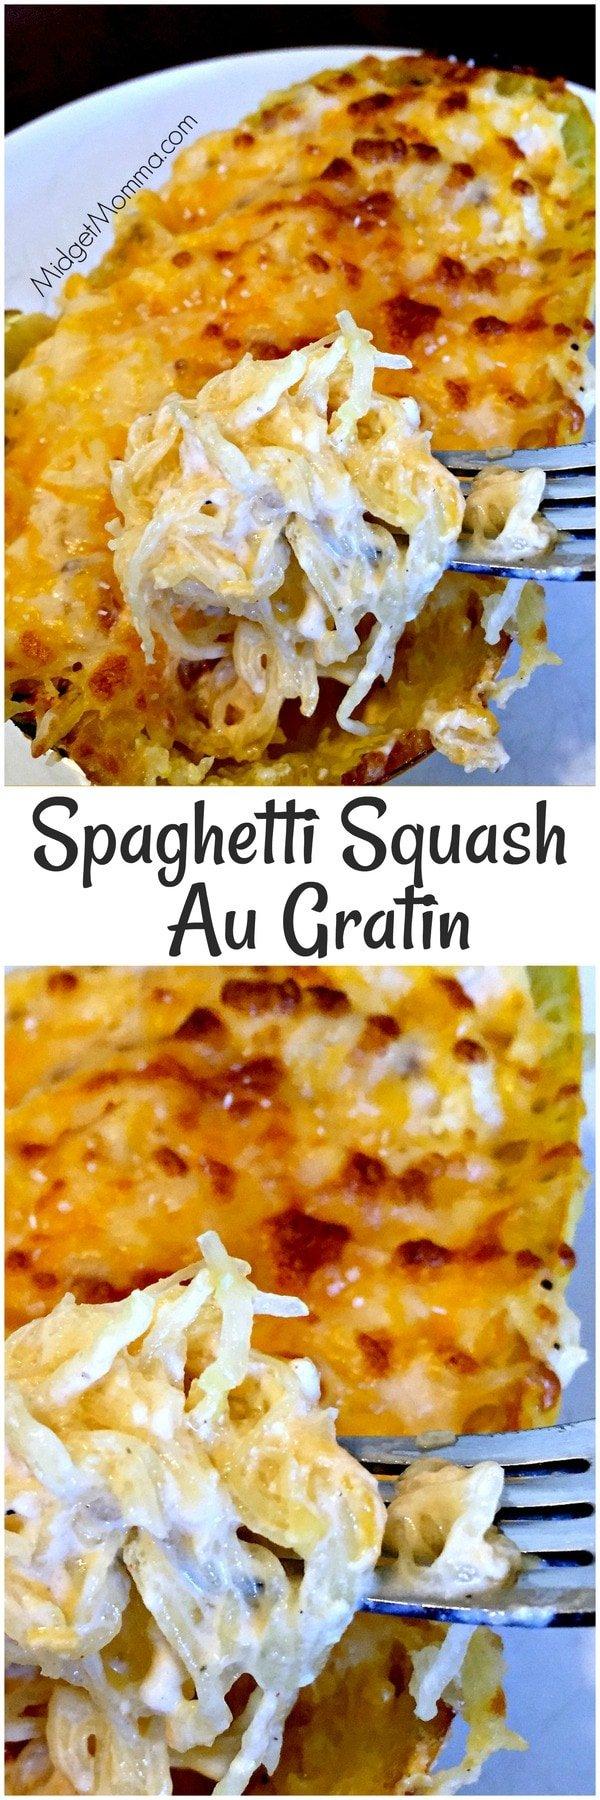 Spaghetti Squash Au Gratin Low carb, All Veggie & Amazing